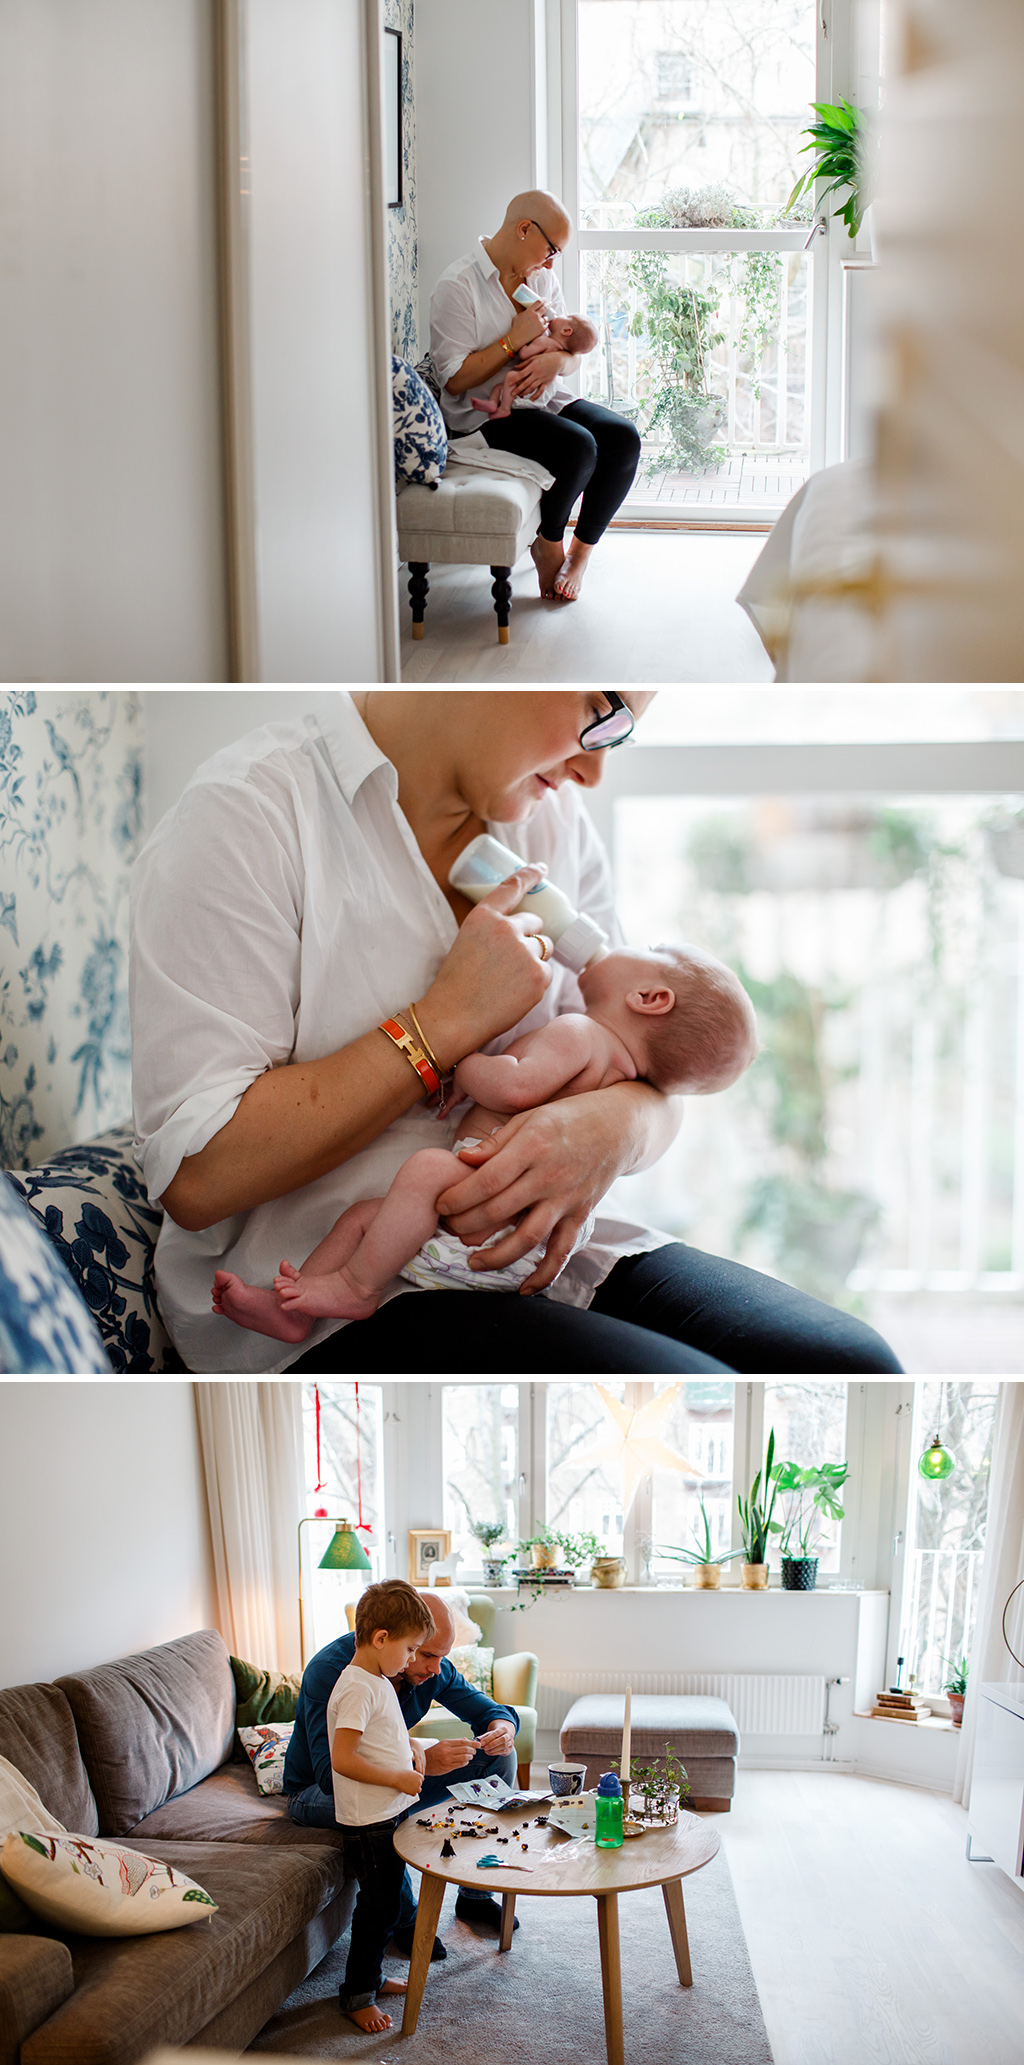 Lifestyle-nyfoddfotografering_newbornphotography_familjefotograf_Stockholm_1.jpg